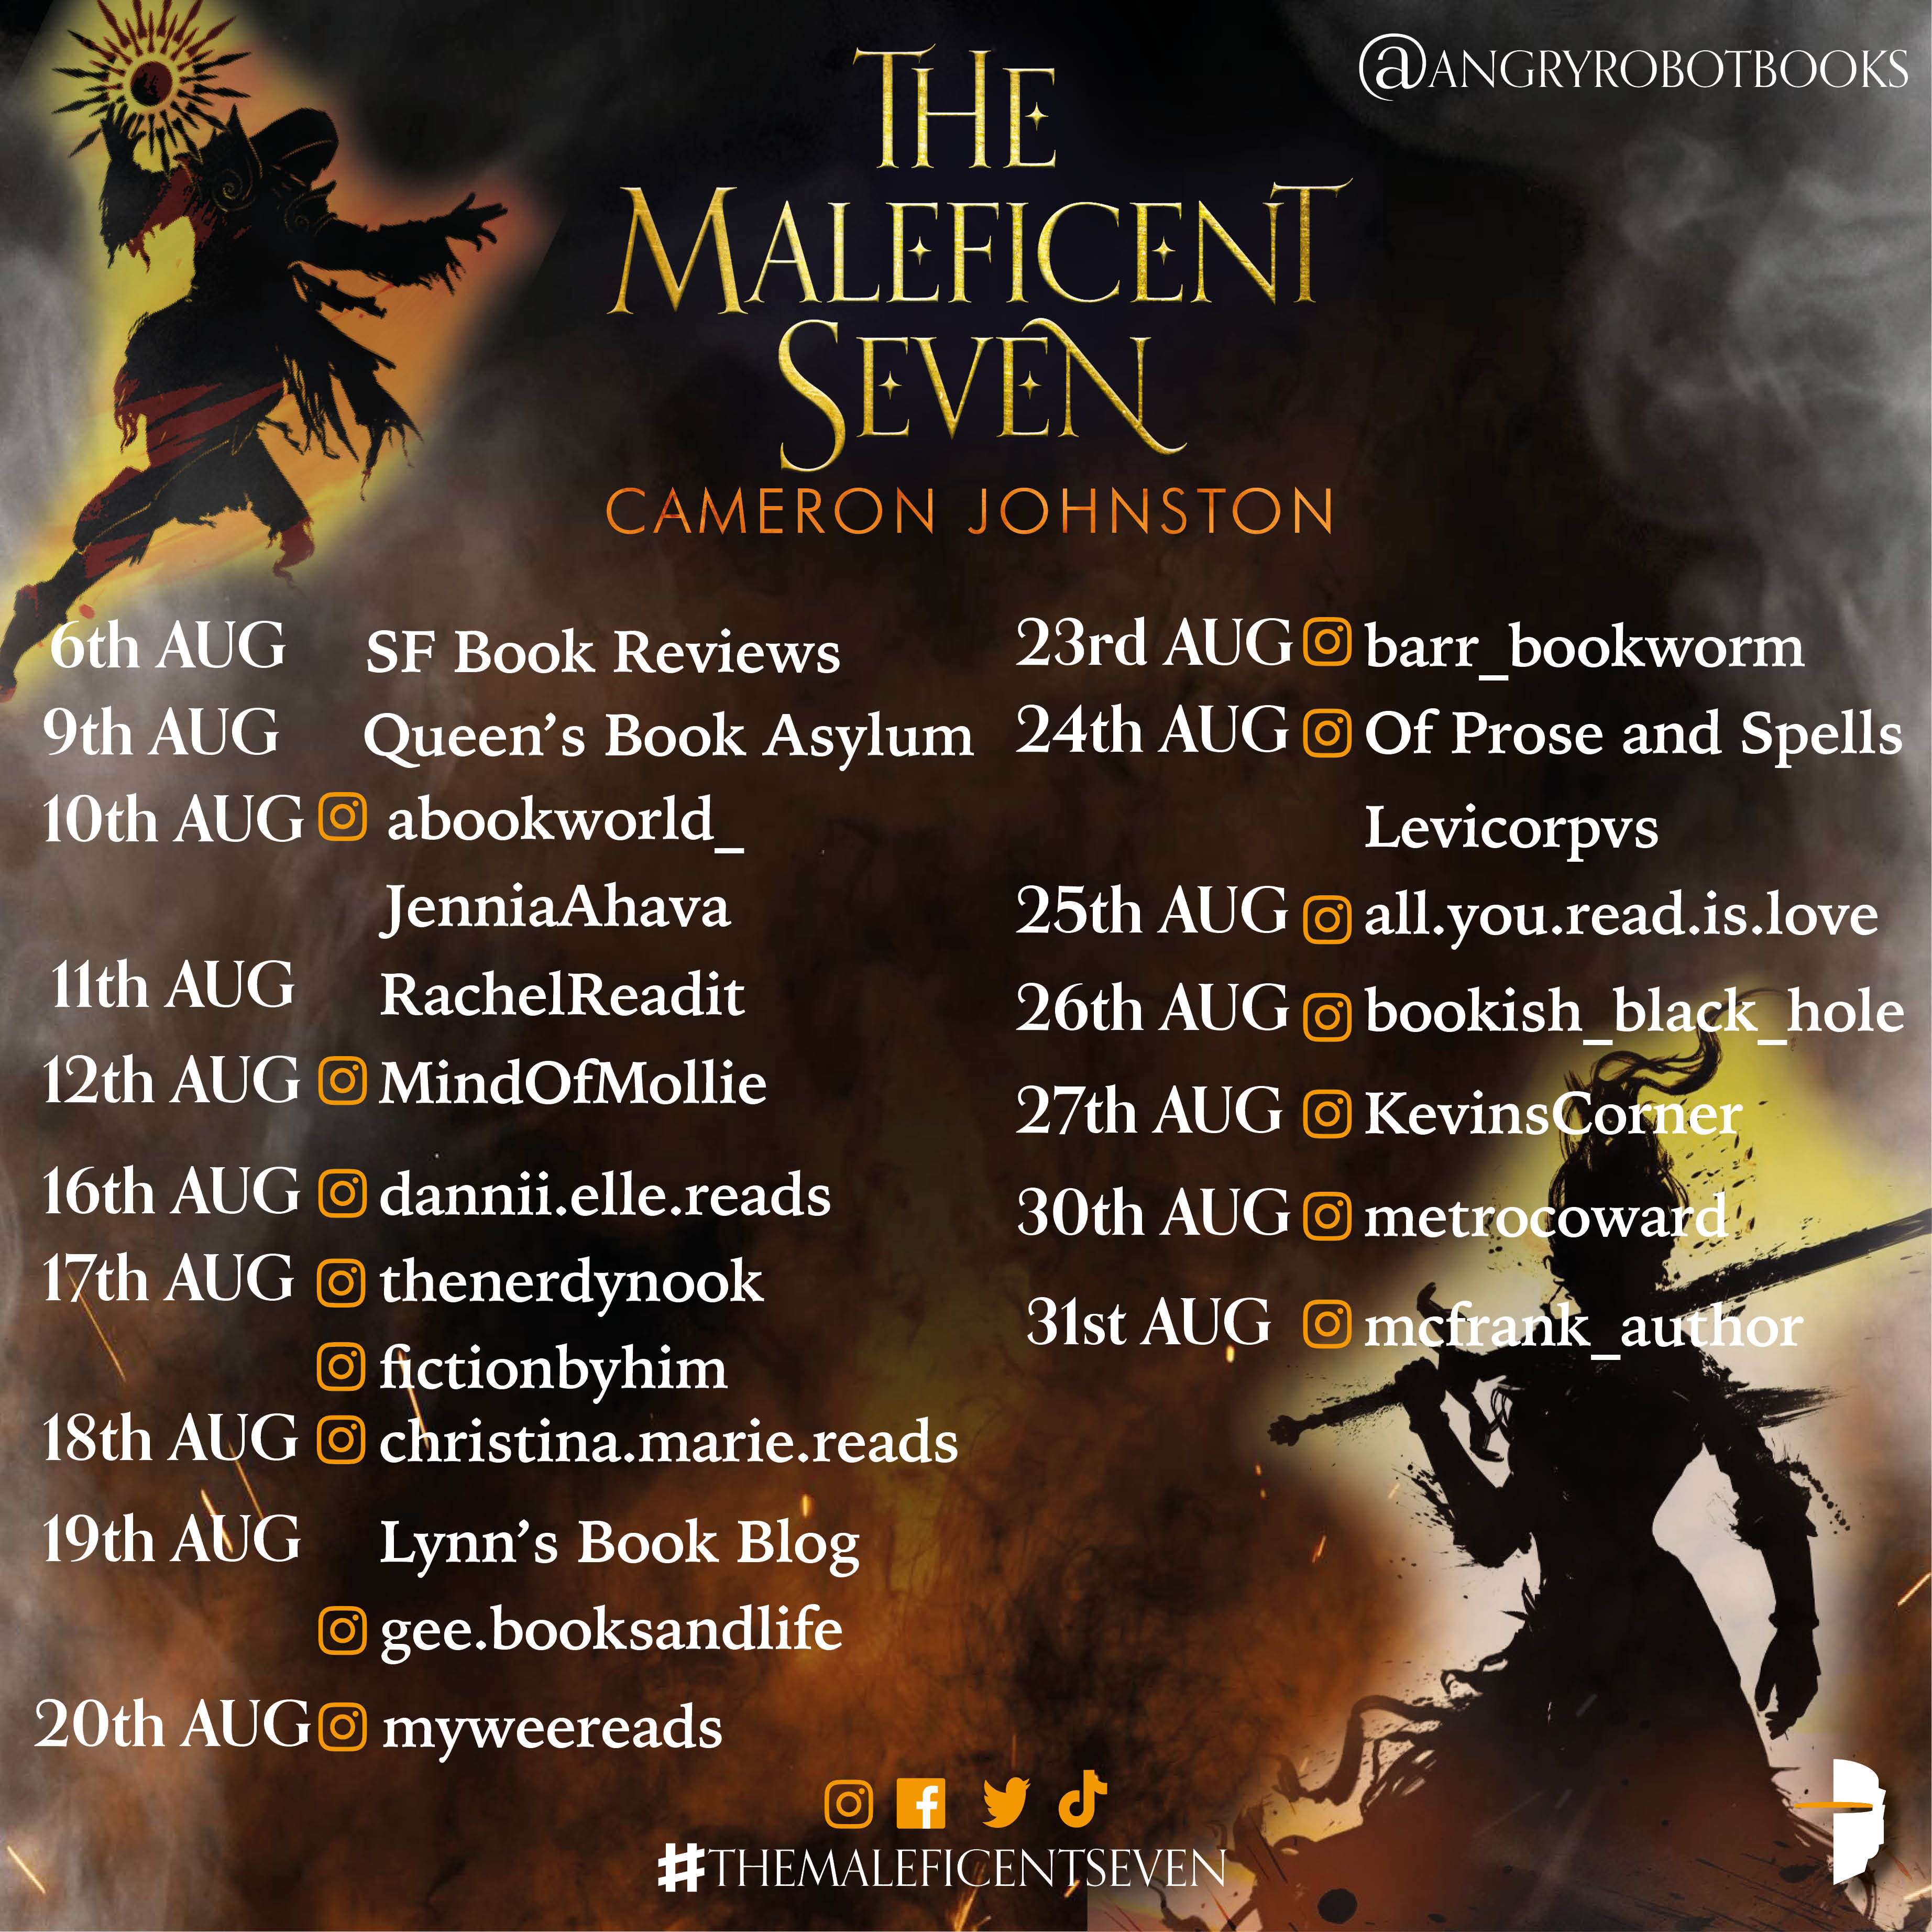 The Maleficent Seven book tour